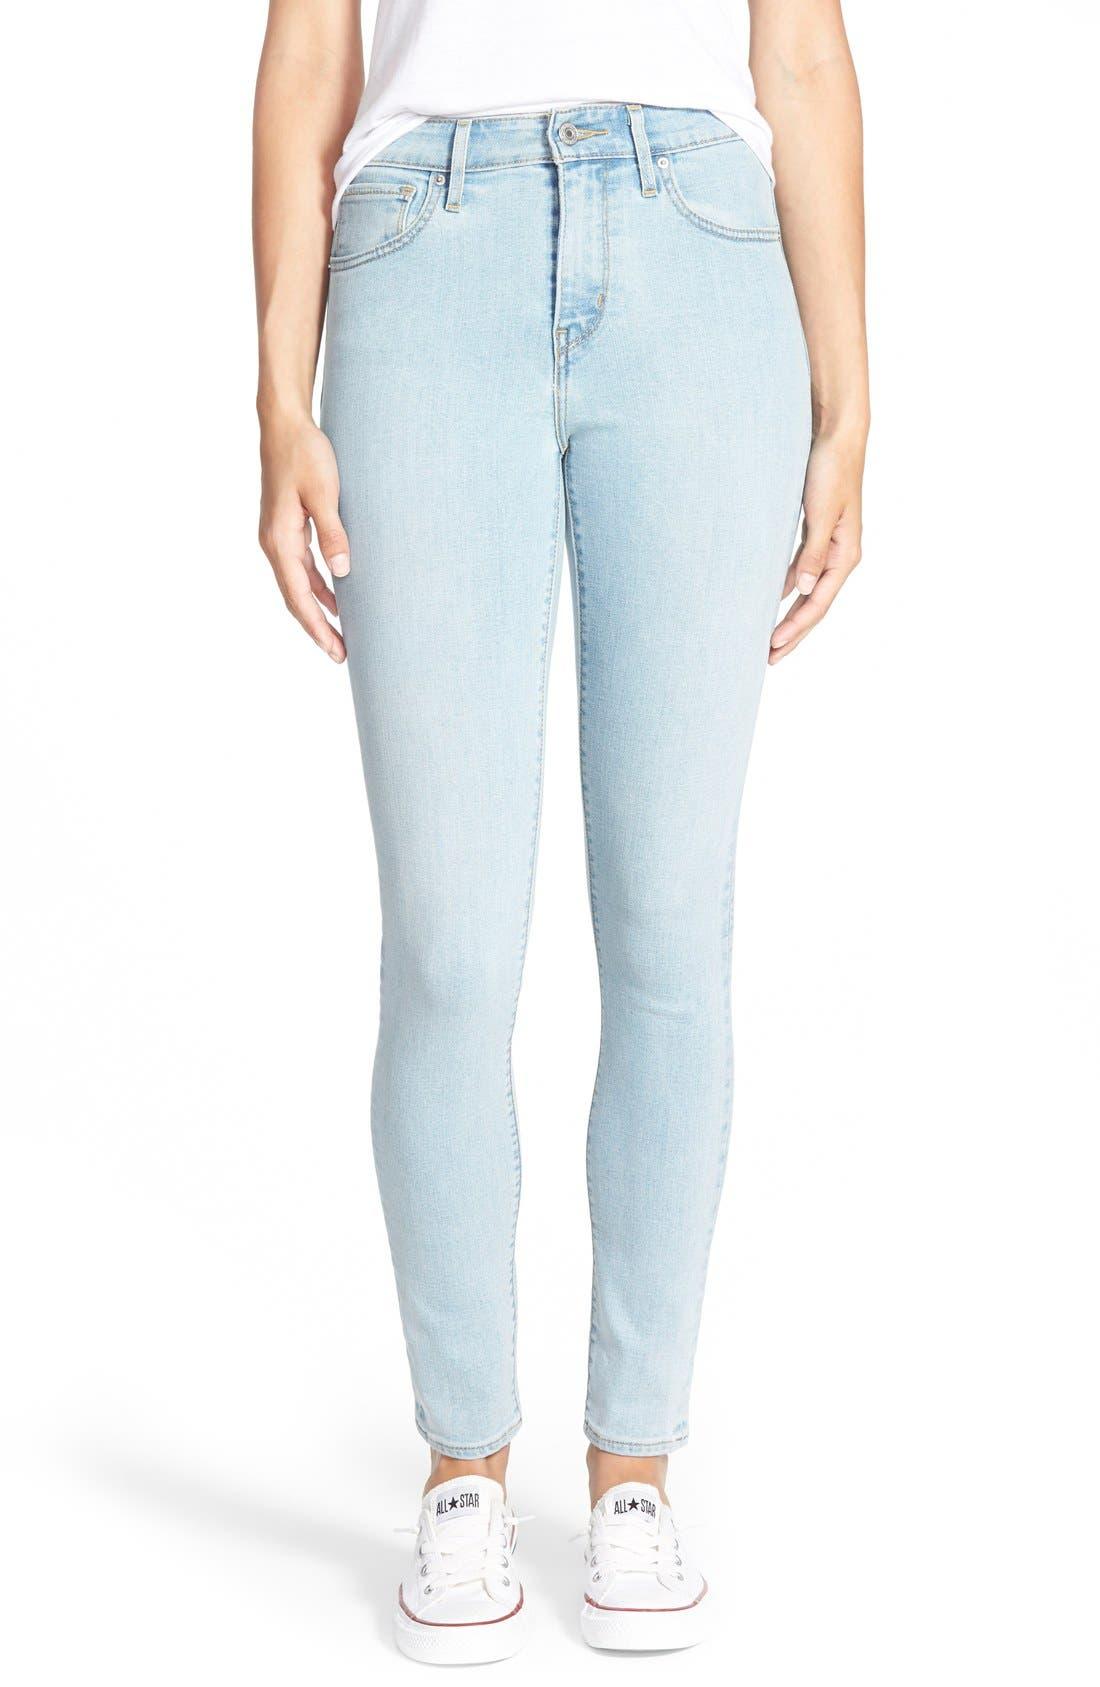 Alternate Image 1 Selected - Levi's® '721' High Rise Skinny Jeans (Light)